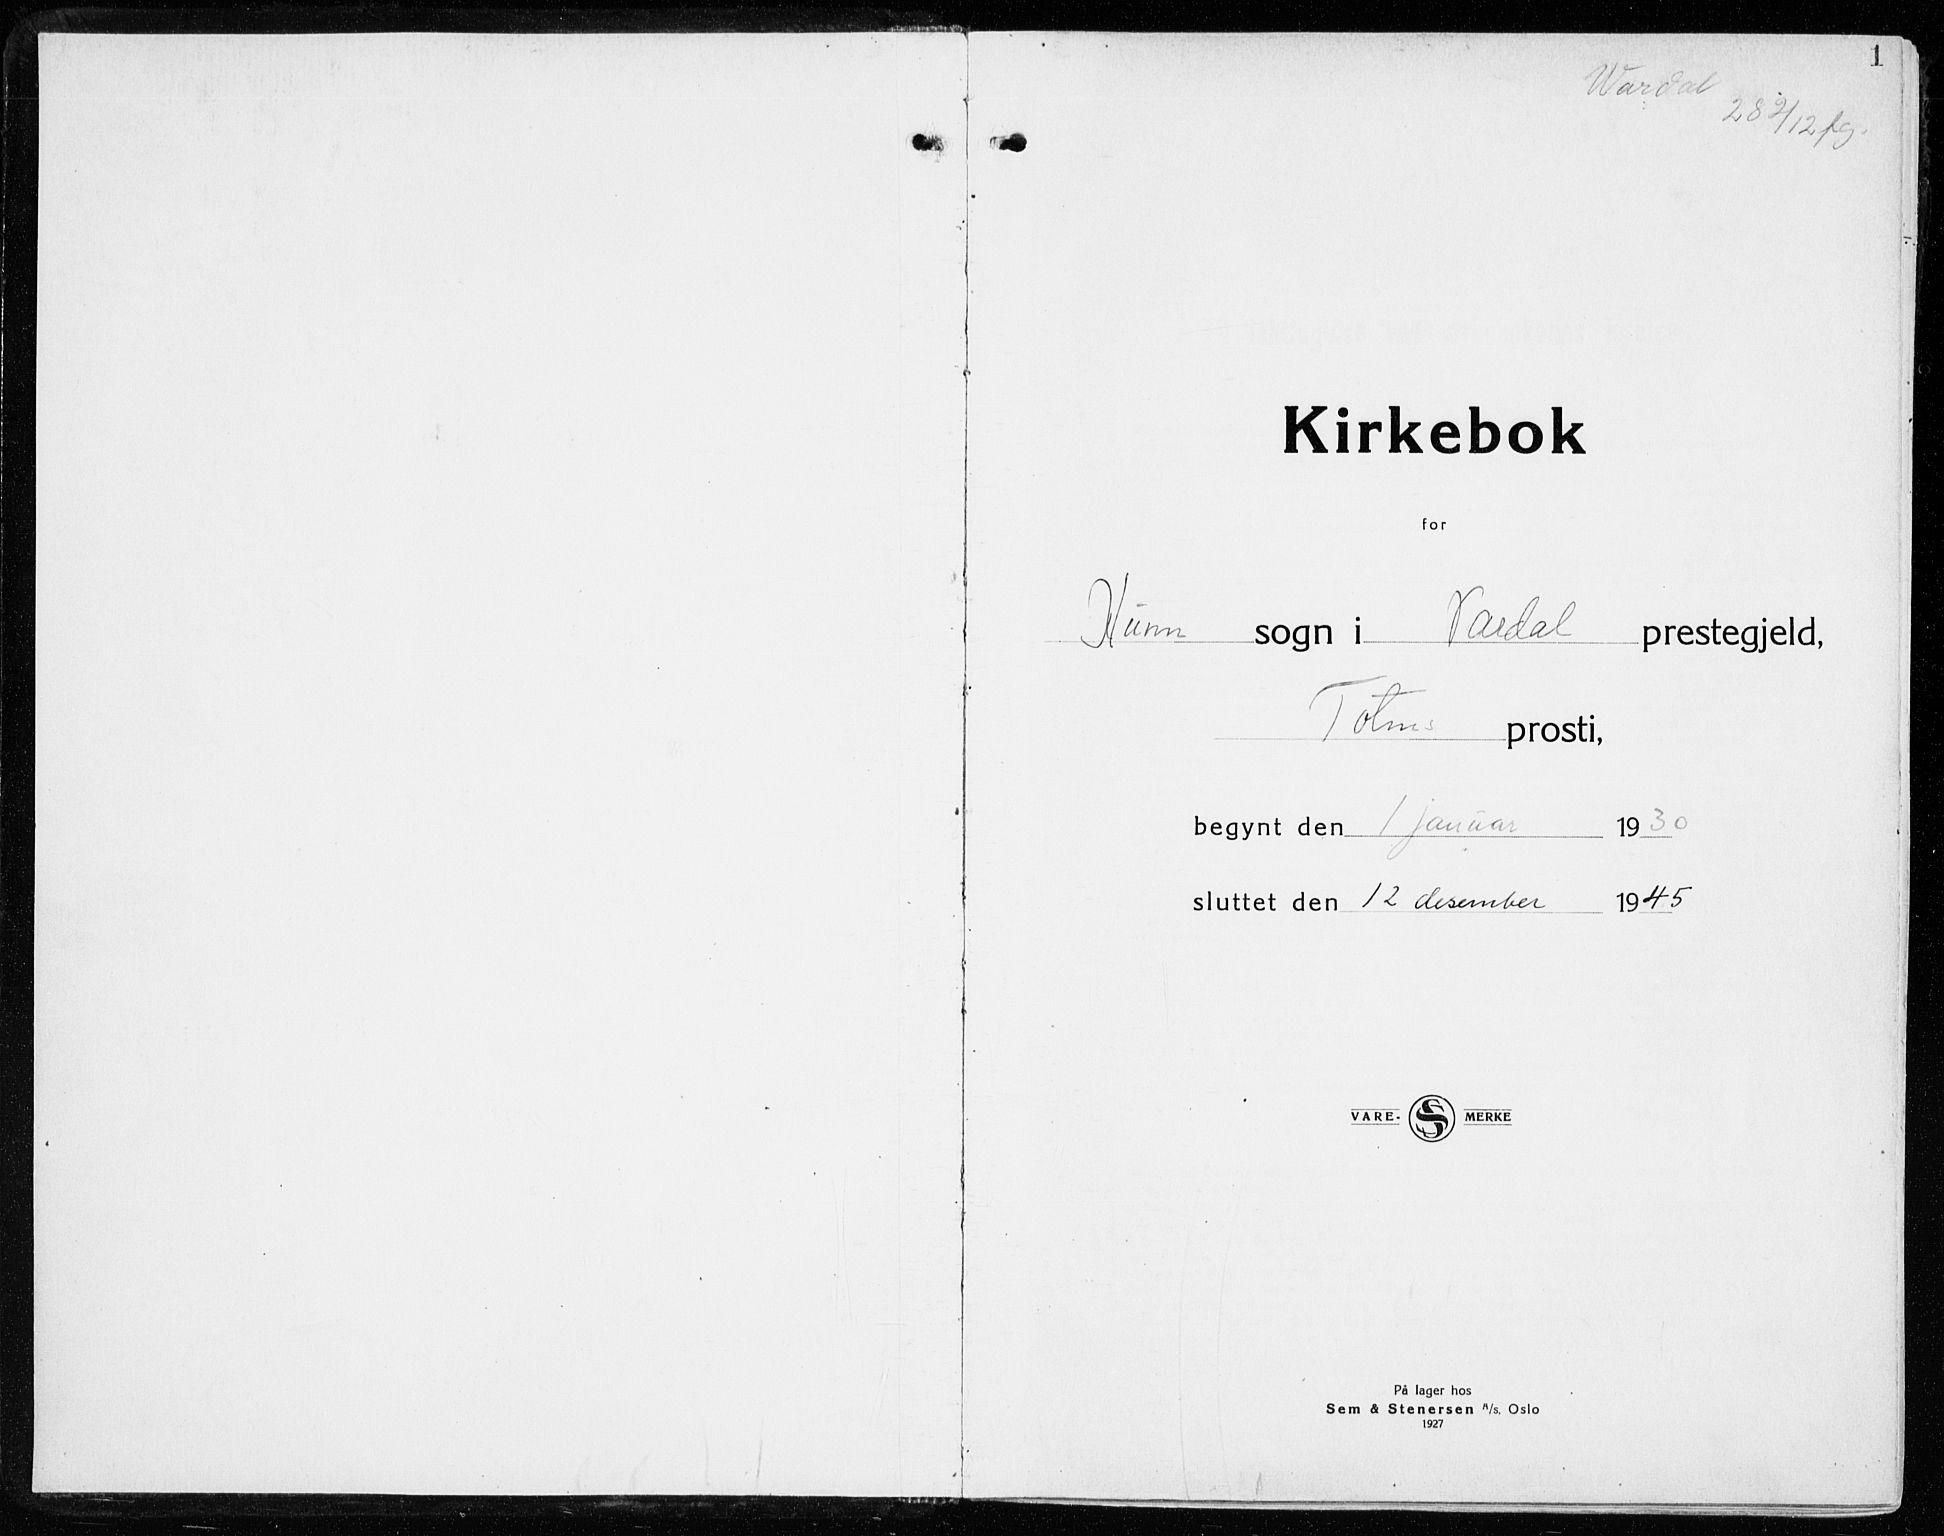 SAH, Vardal prestekontor, H/Ha/Haa/L0018: Ministerialbok nr. 18, 1930-1945, s. 1